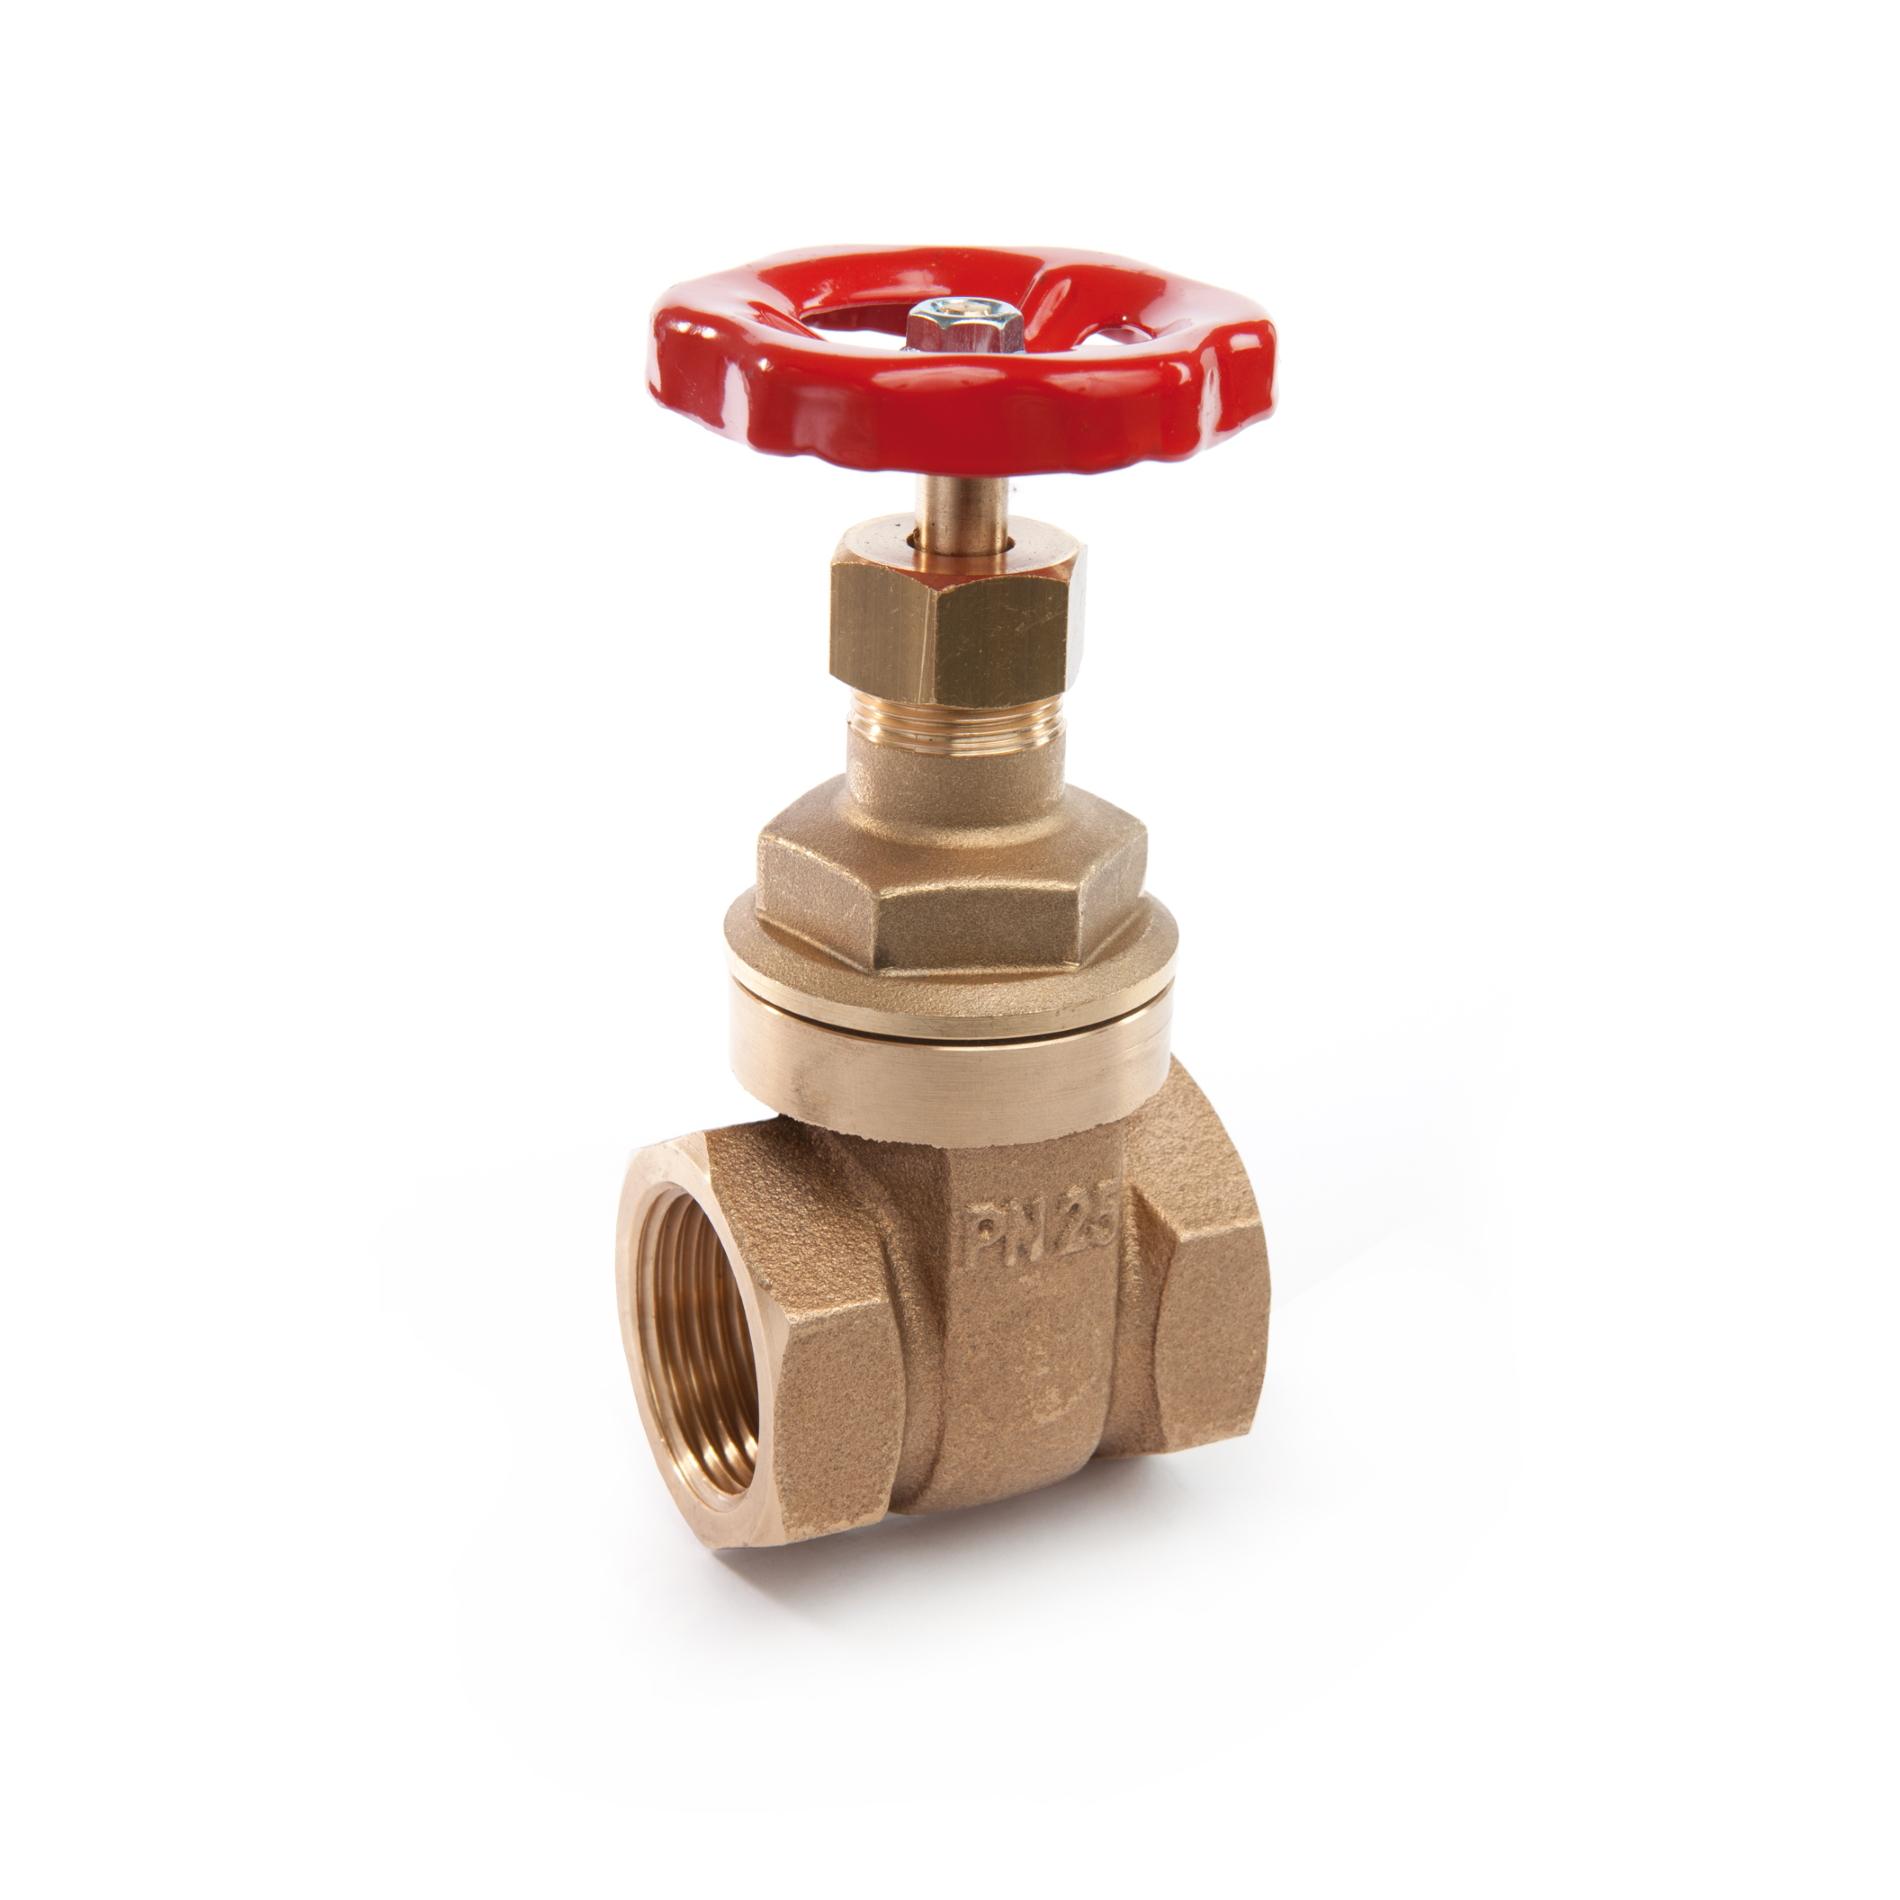 200 Saracinesca bronzo tipo extra pesante Bronze gate valve heavy type FxF PN25